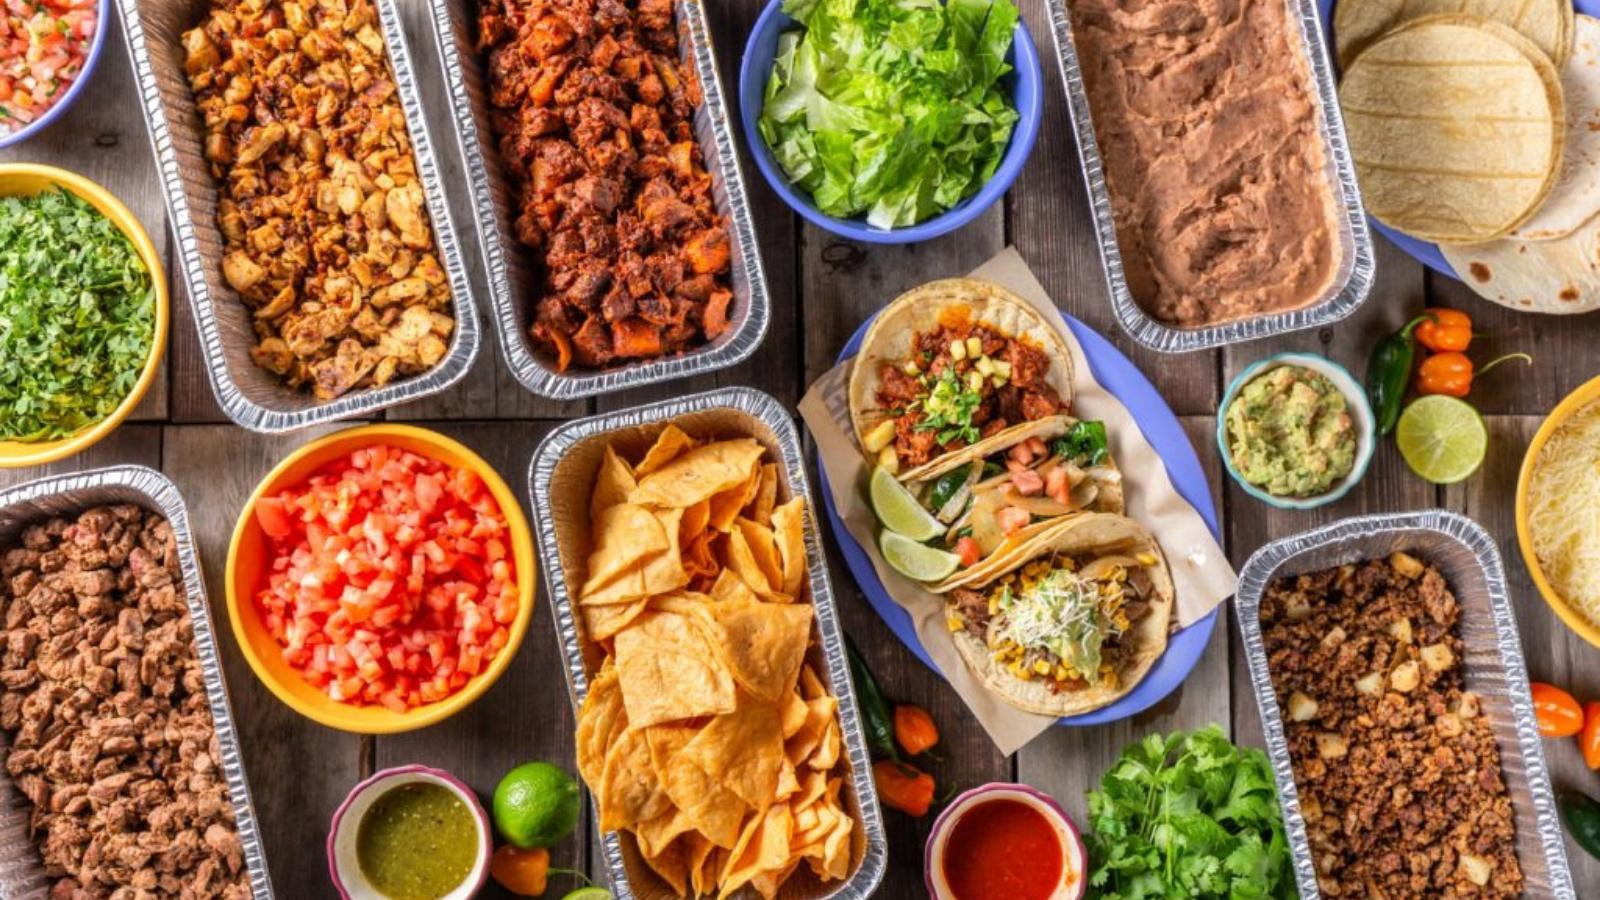 Miller's Taco Bar Image